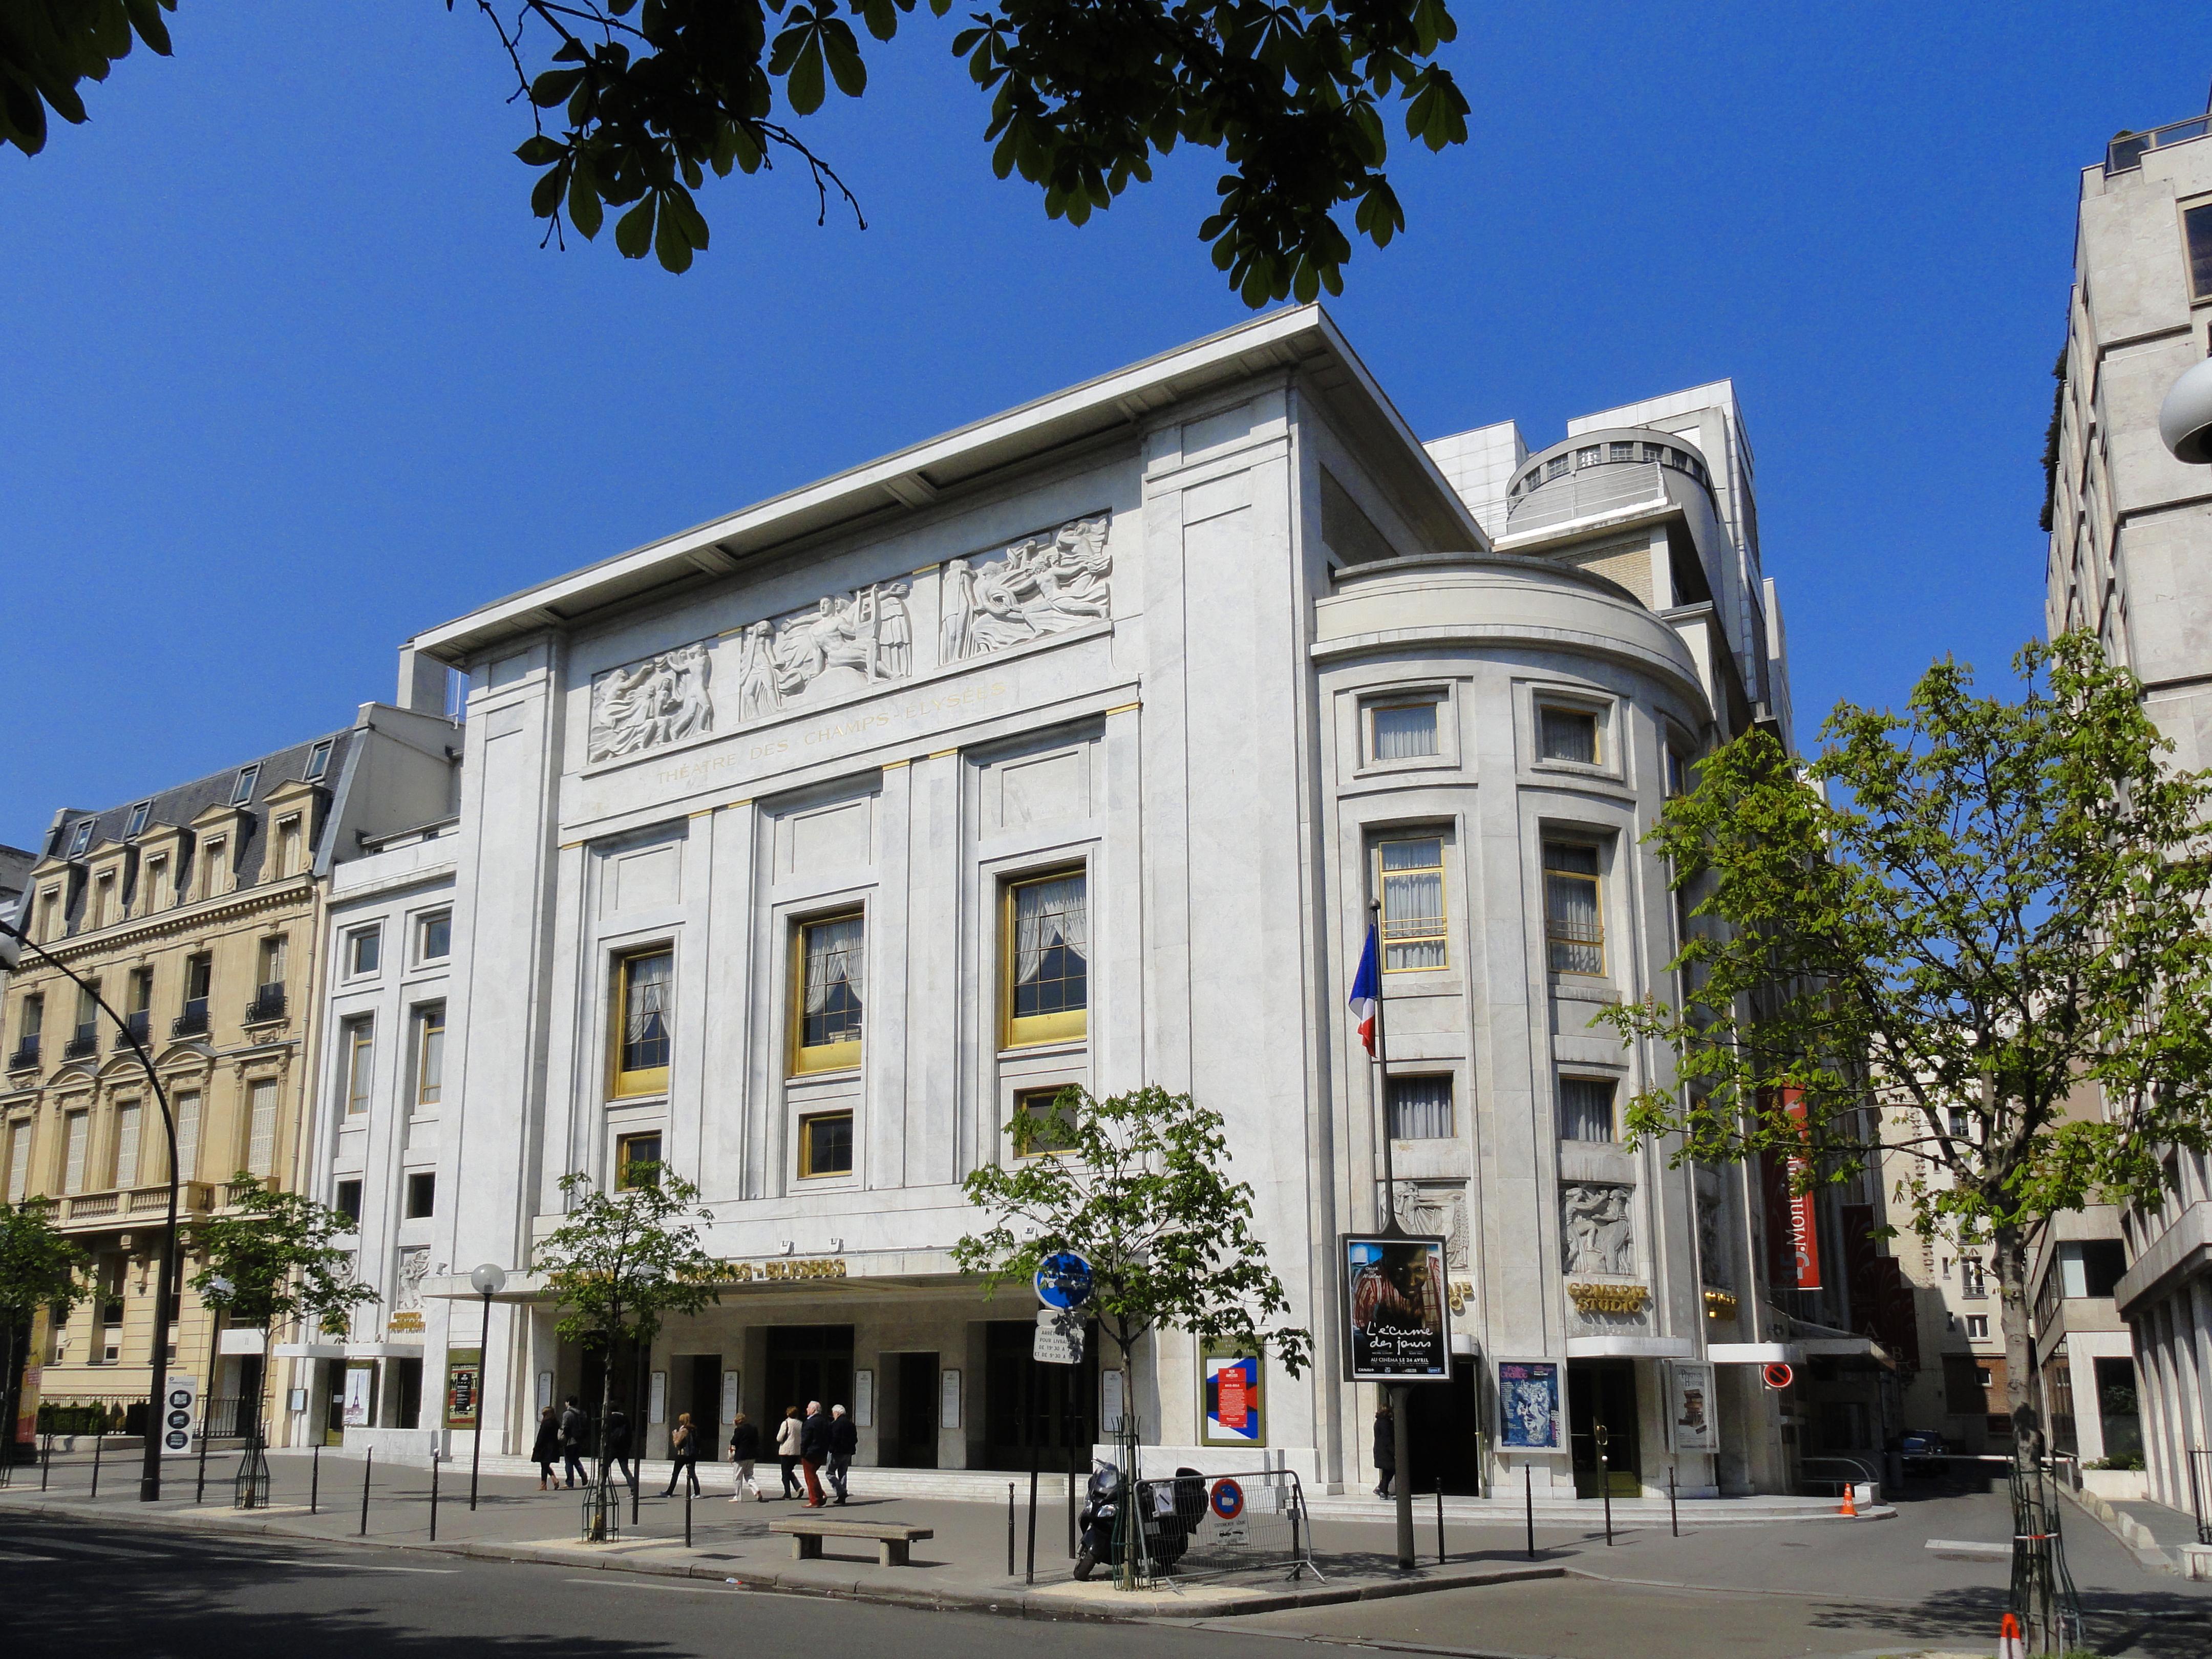 Hotel Des Champs Elysees